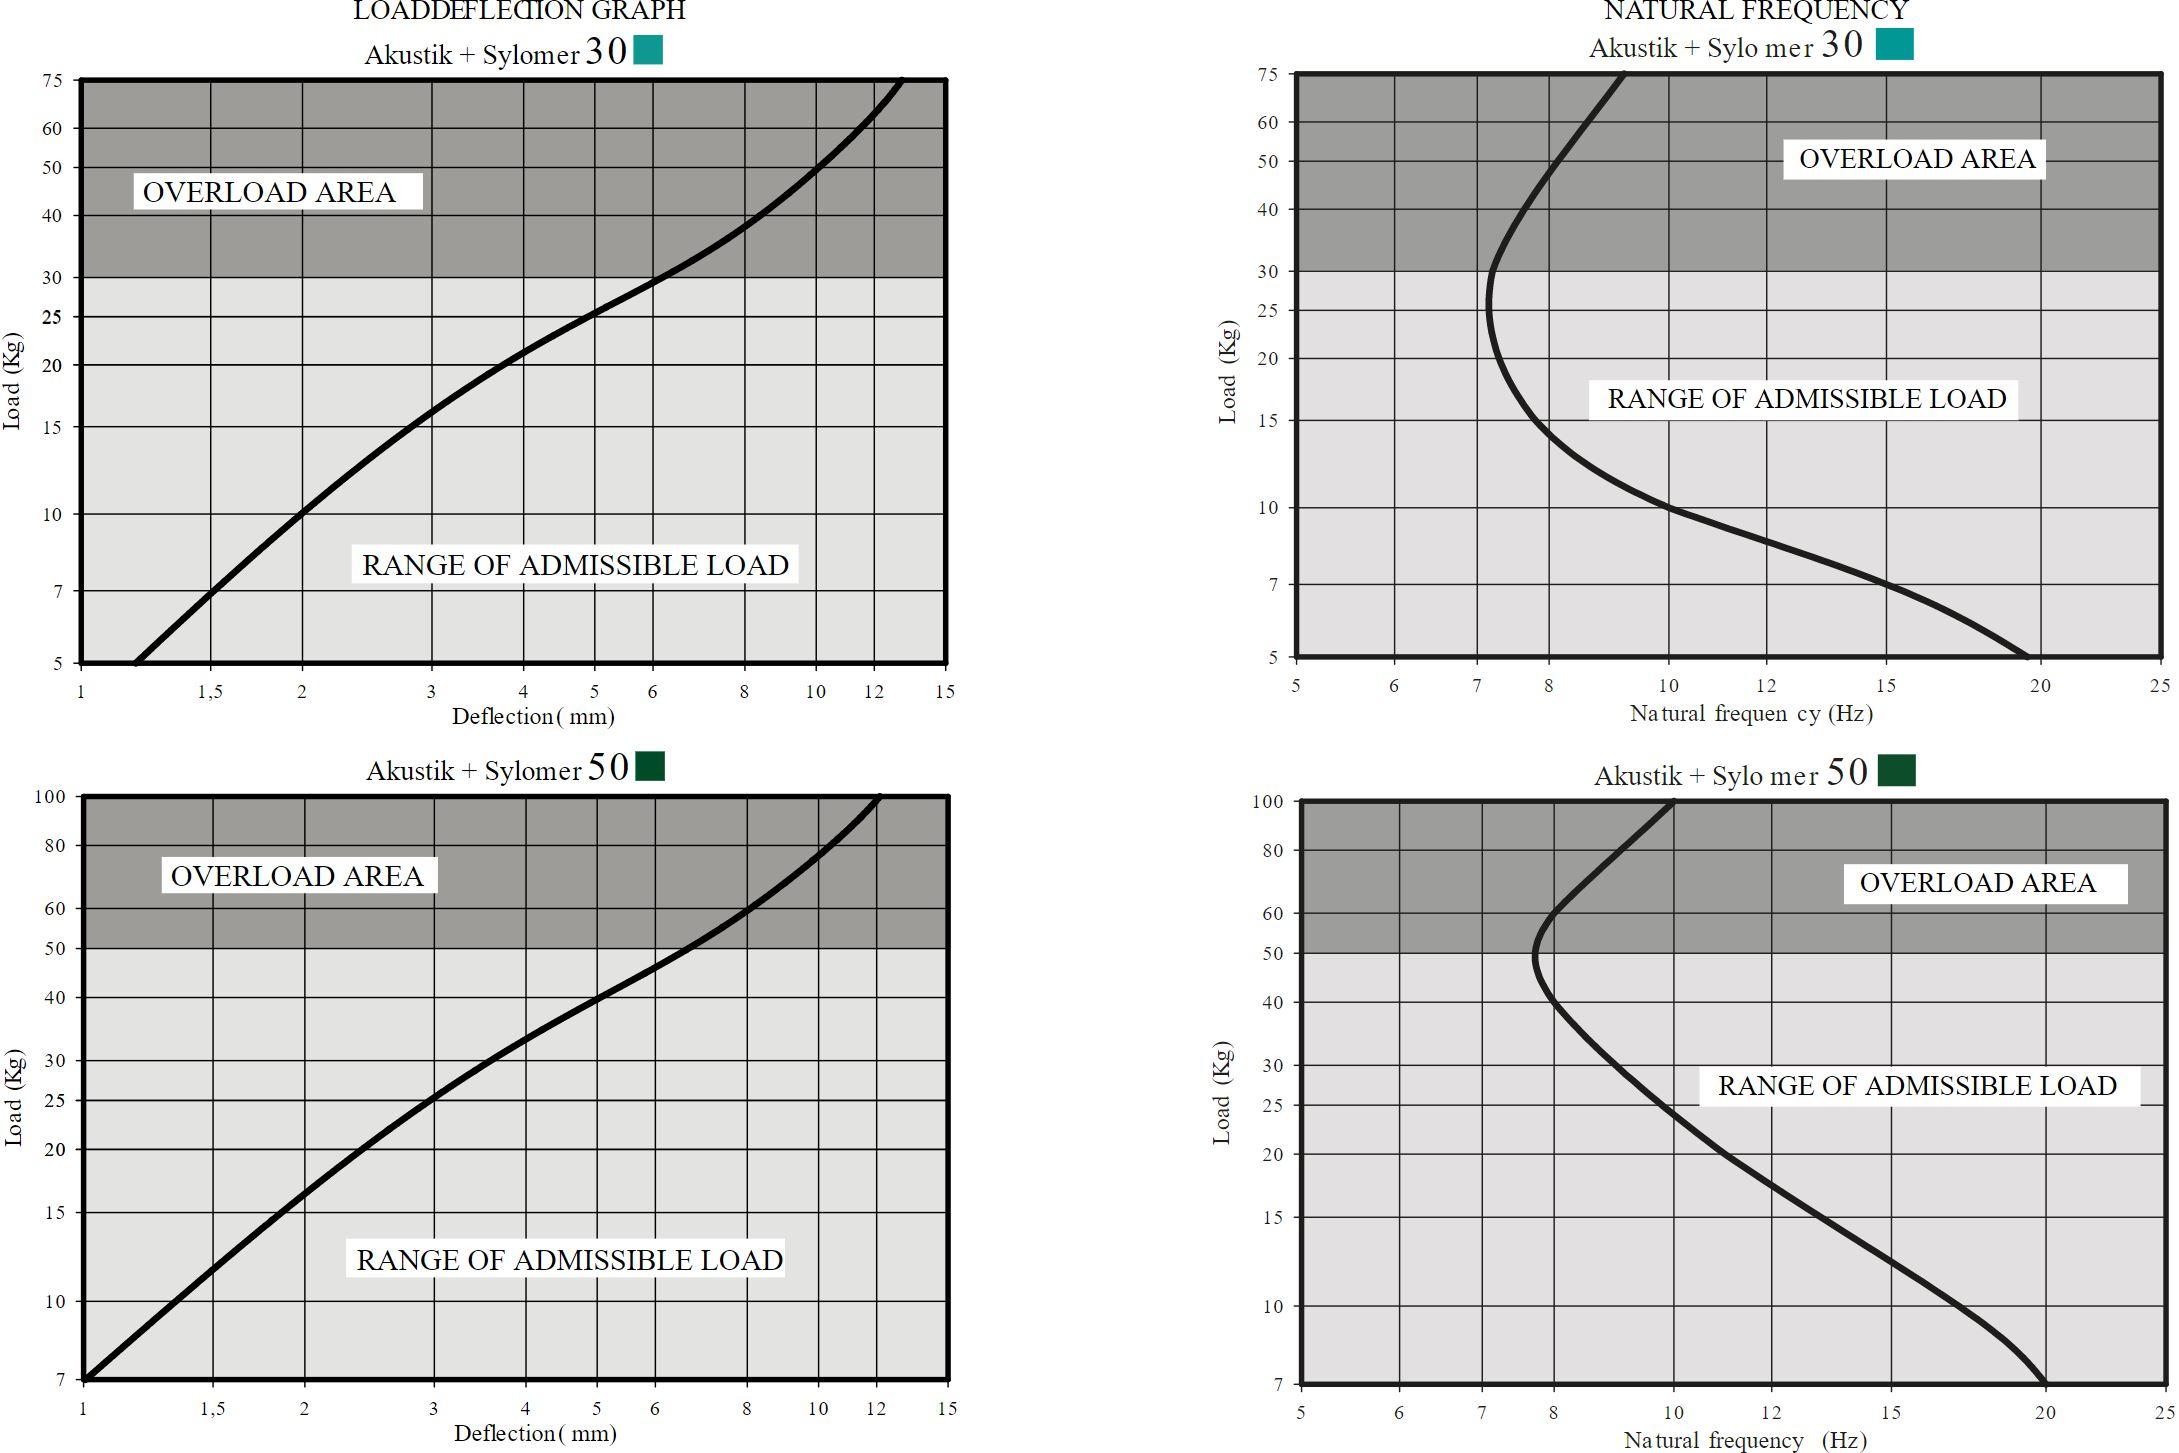 Akustik GB + Sylomer Curve 1